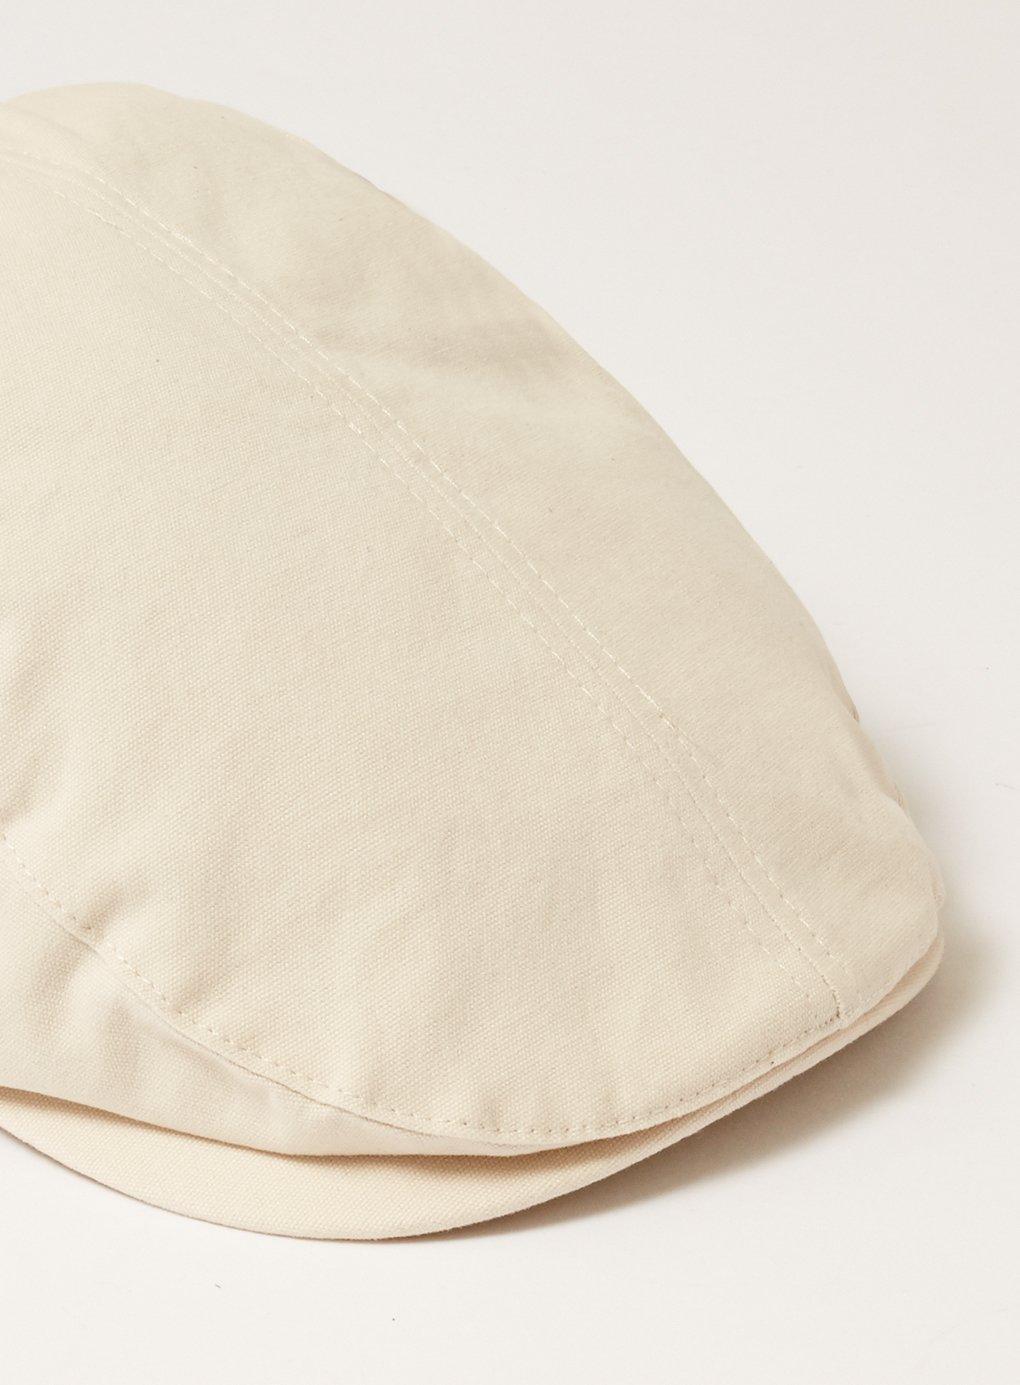 584f96ada22 Lyst - TOPMAN Tone Canvas Flat Cap in Natural for Men